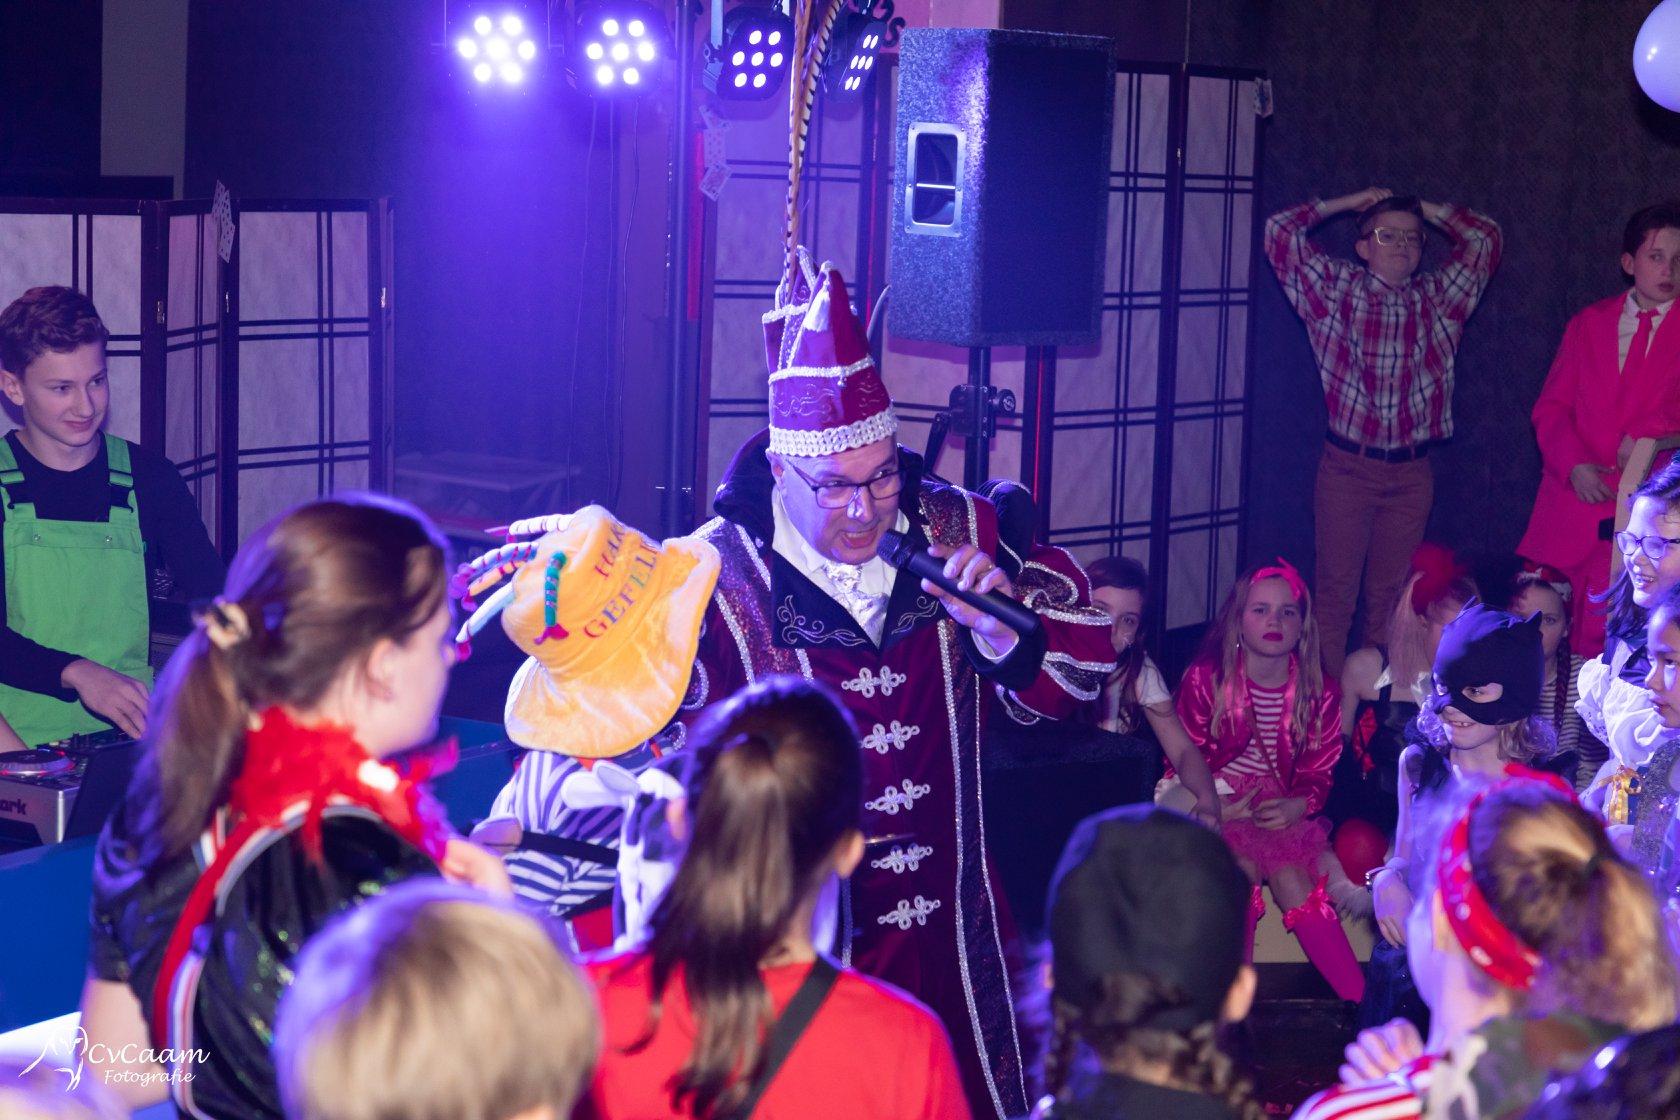 Carnavalsvereniging de Meekrap